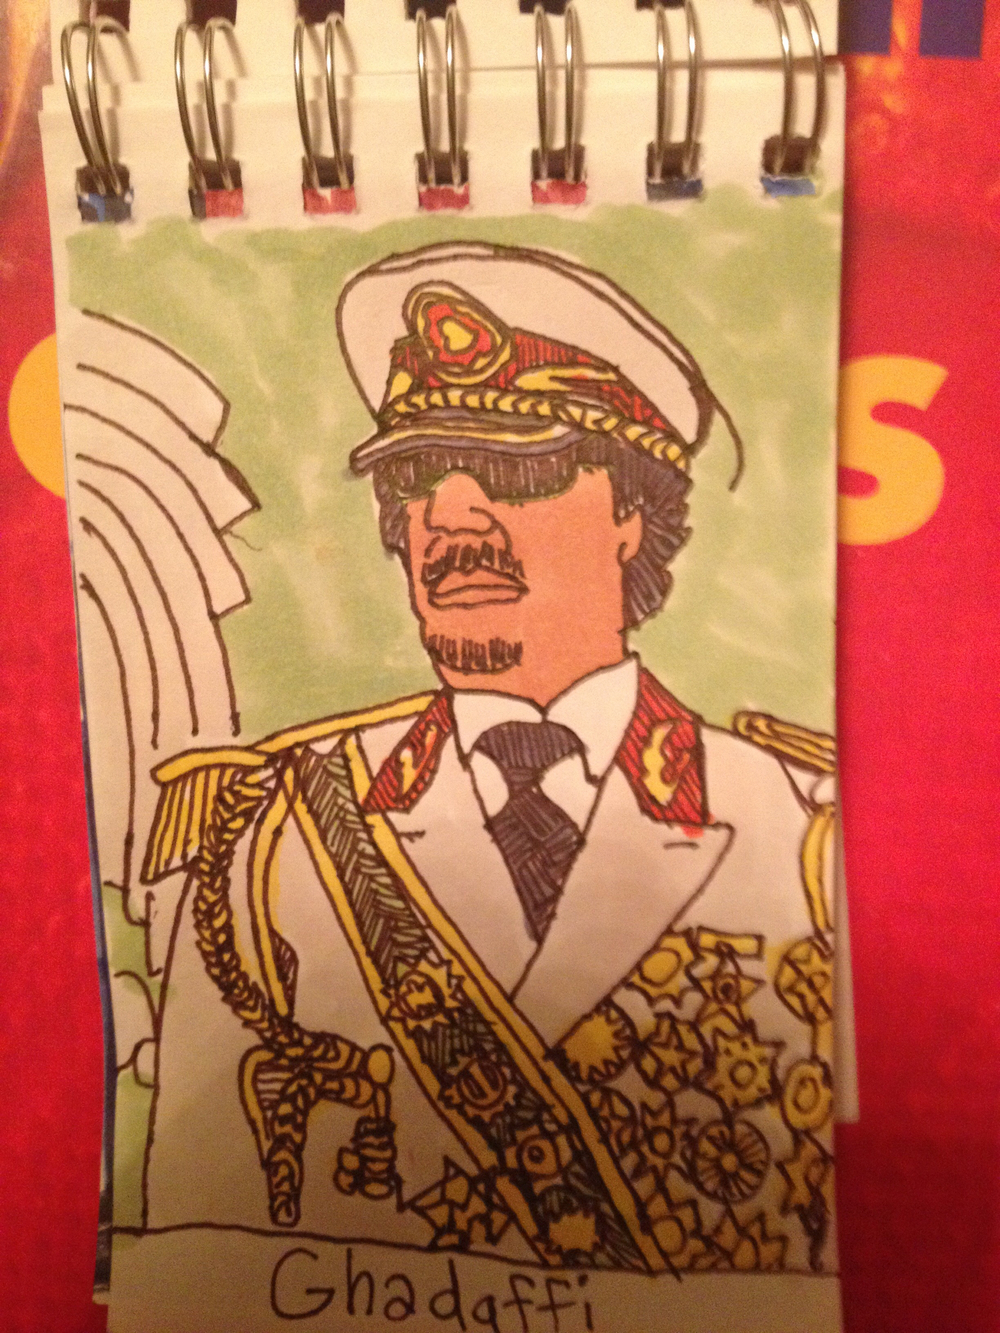 Ghadaffi.JPG